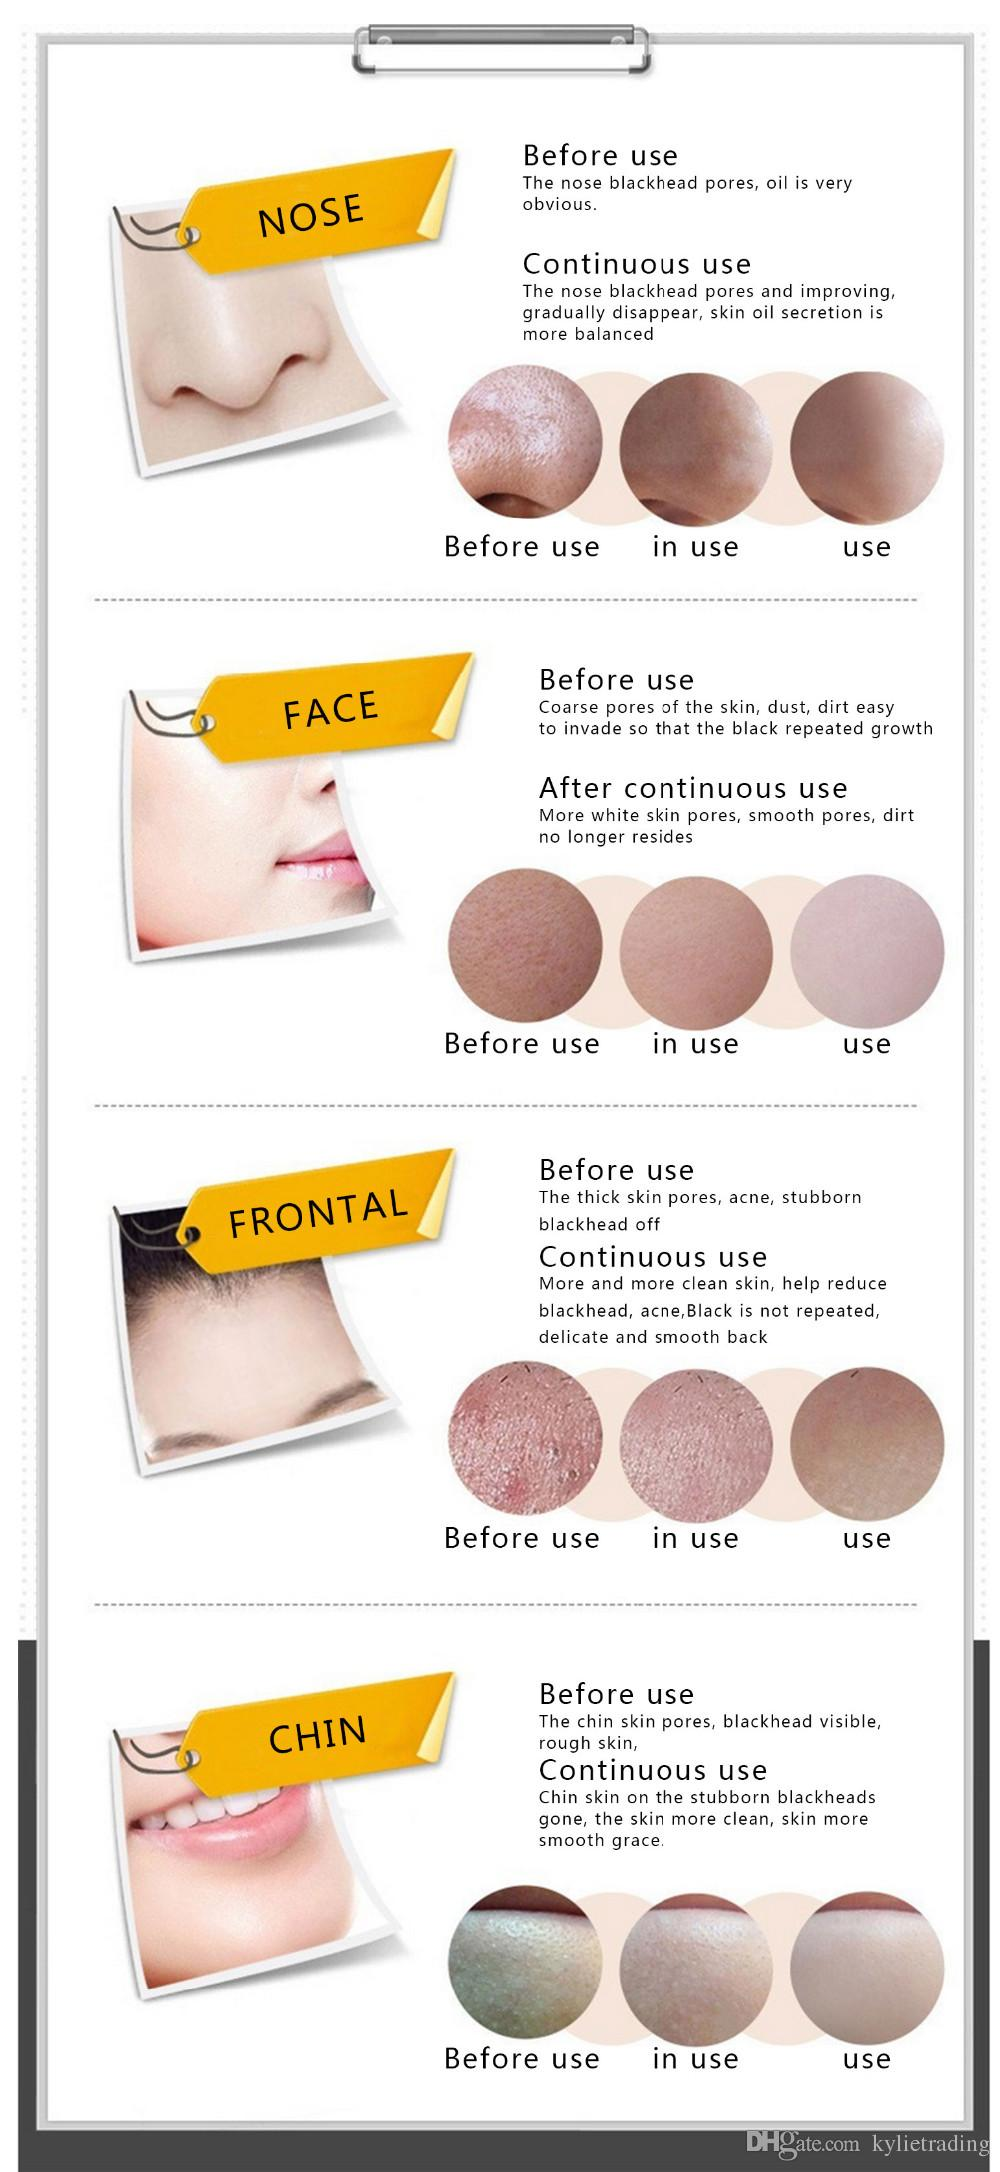 BIOAQUA Charcoal Mask Blackhead Remover Black Mask Deep Cleasing Peeling Off Face Mask Beauty Skin Care 60g